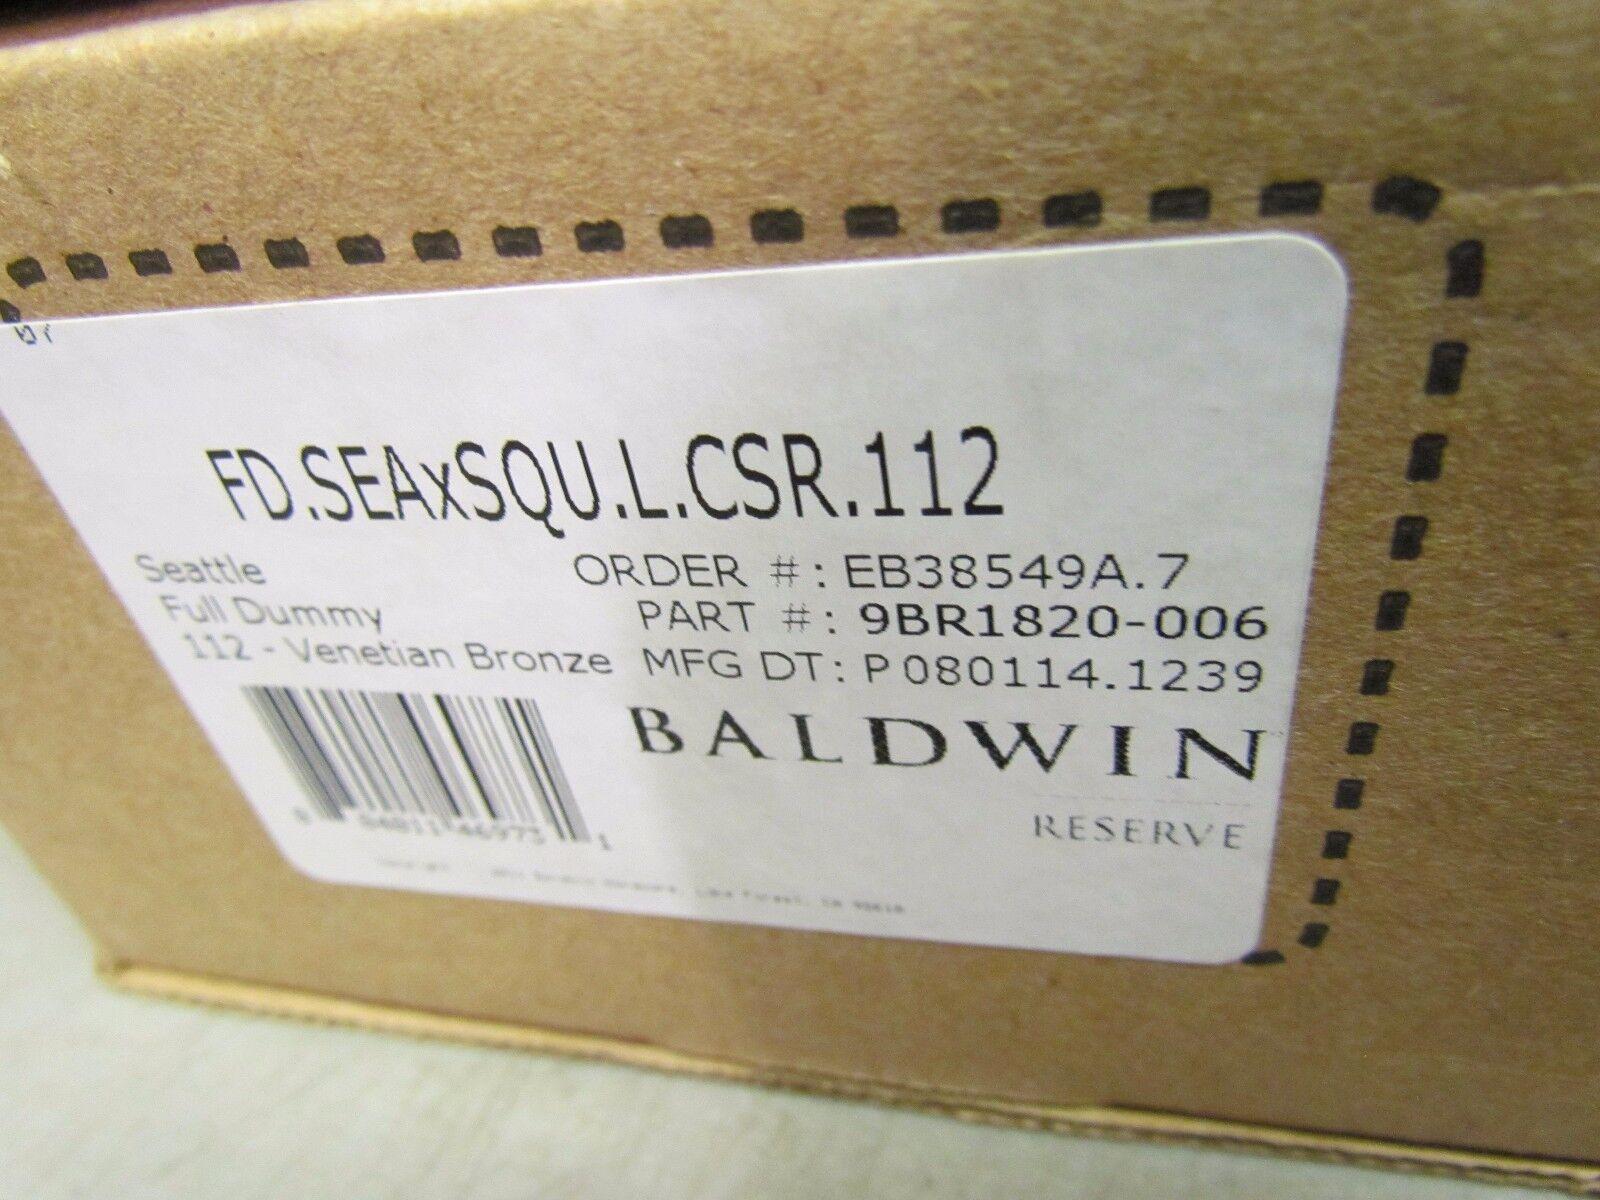 NEW Baldwin Reserve FD.SEAxSQU.L.CSR.112 Full Dummy Venetian Bronze